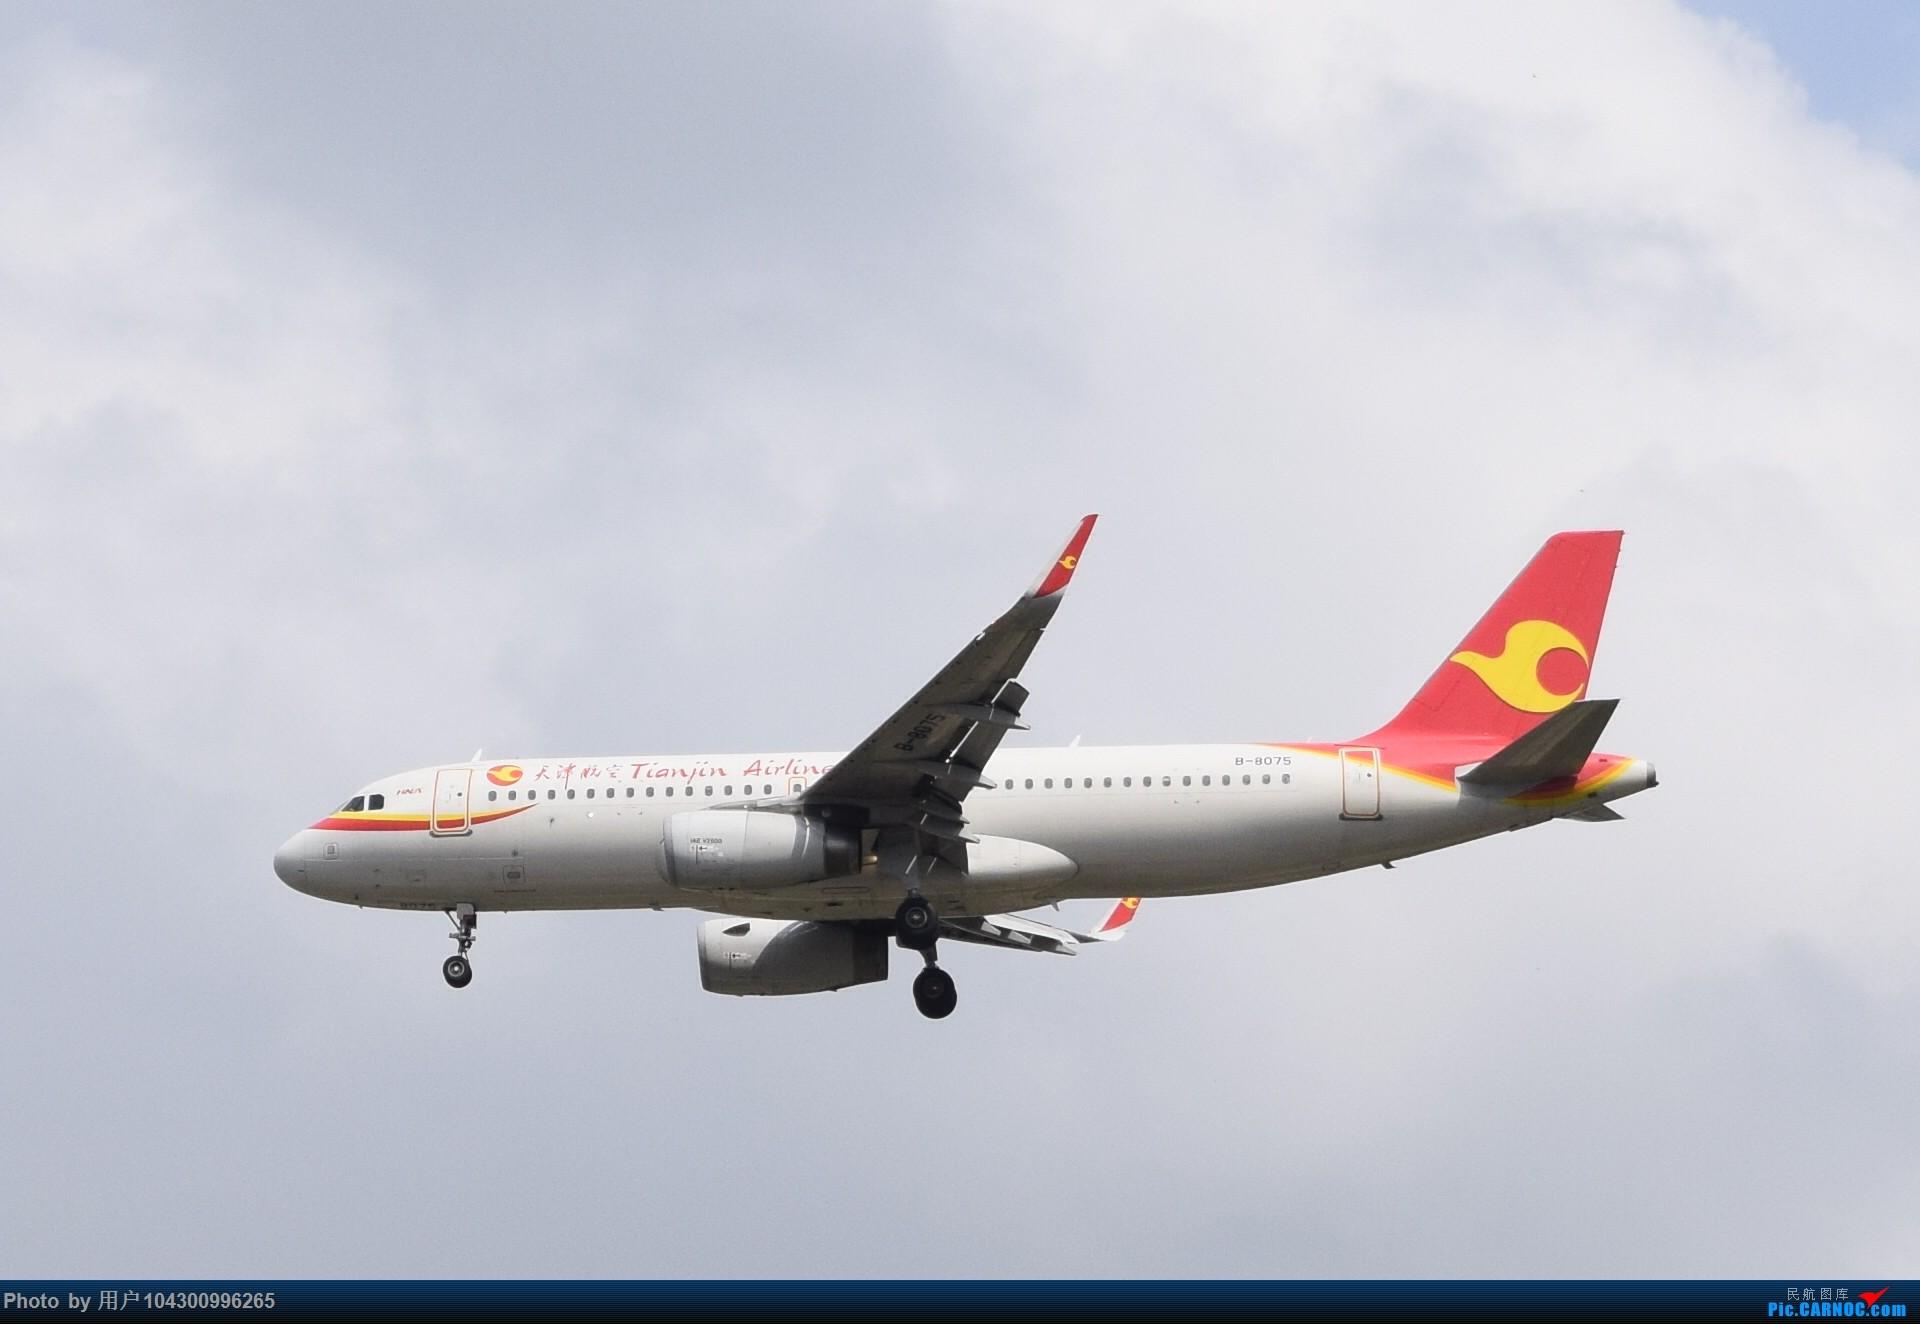 Re:[原创]贵阳龙洞堡杂图一览 AIRBUS A320-200 B-8075 中国贵阳龙洞堡国际机场